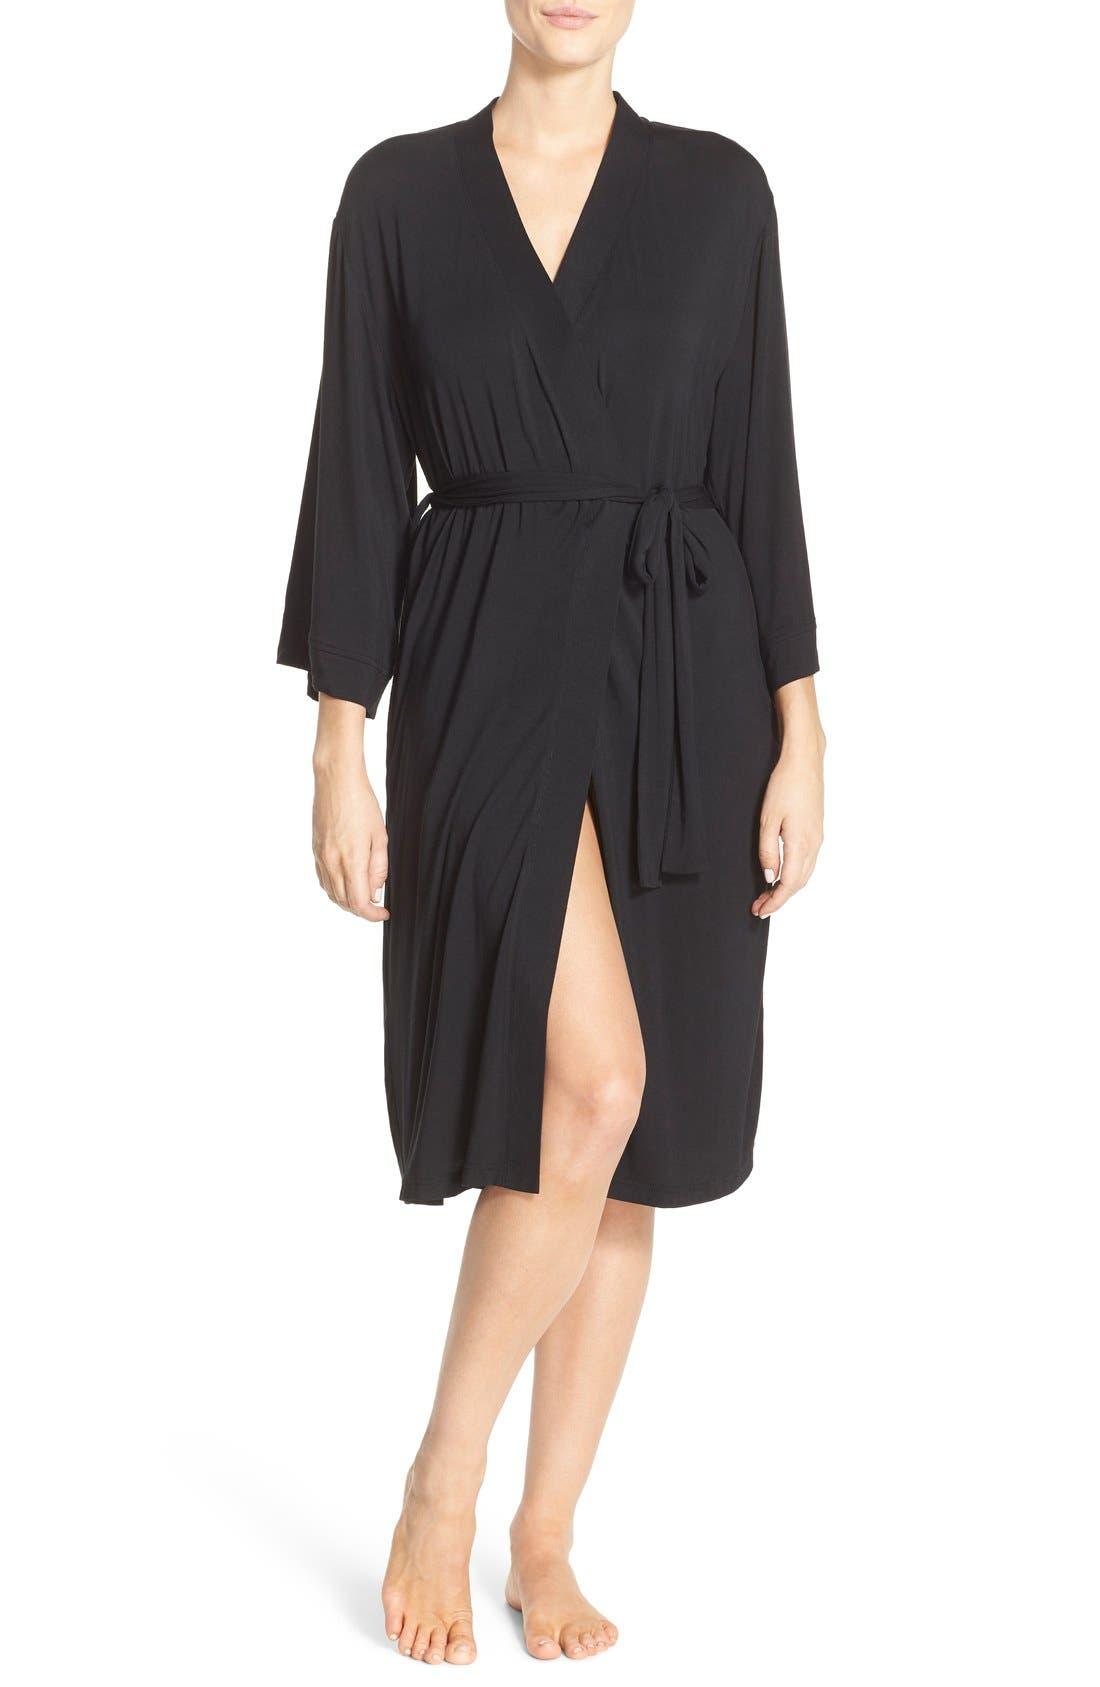 Alternate Image 1 Selected - Nordstrom Lingerie 'Moonlight' Jersey Robe